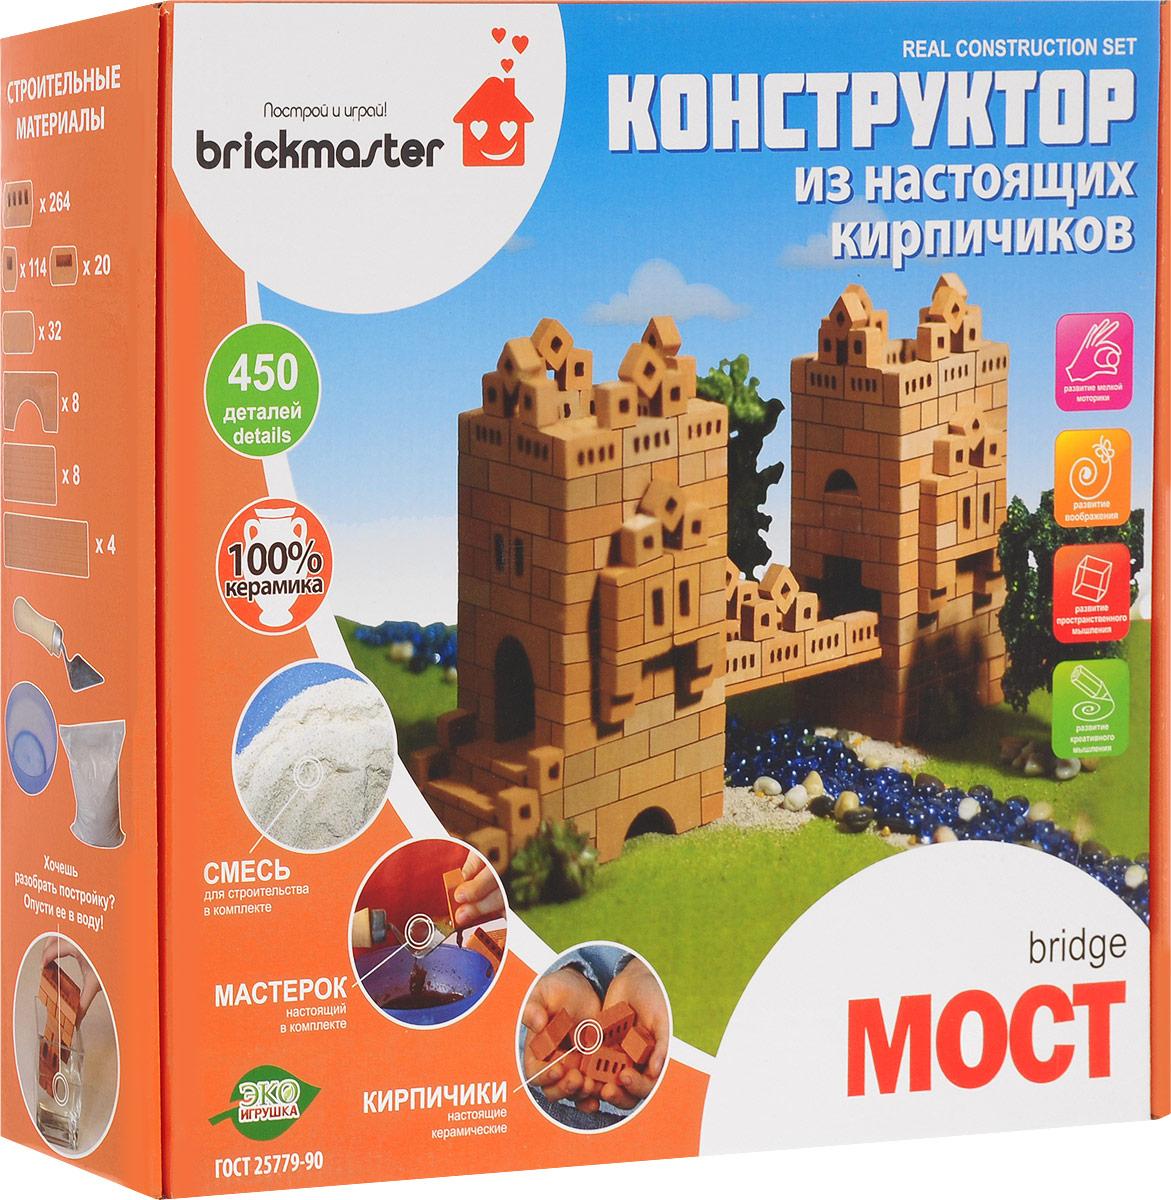 Brickmaster Конструктор Мост конструктор brickmaster изба 37 деталей